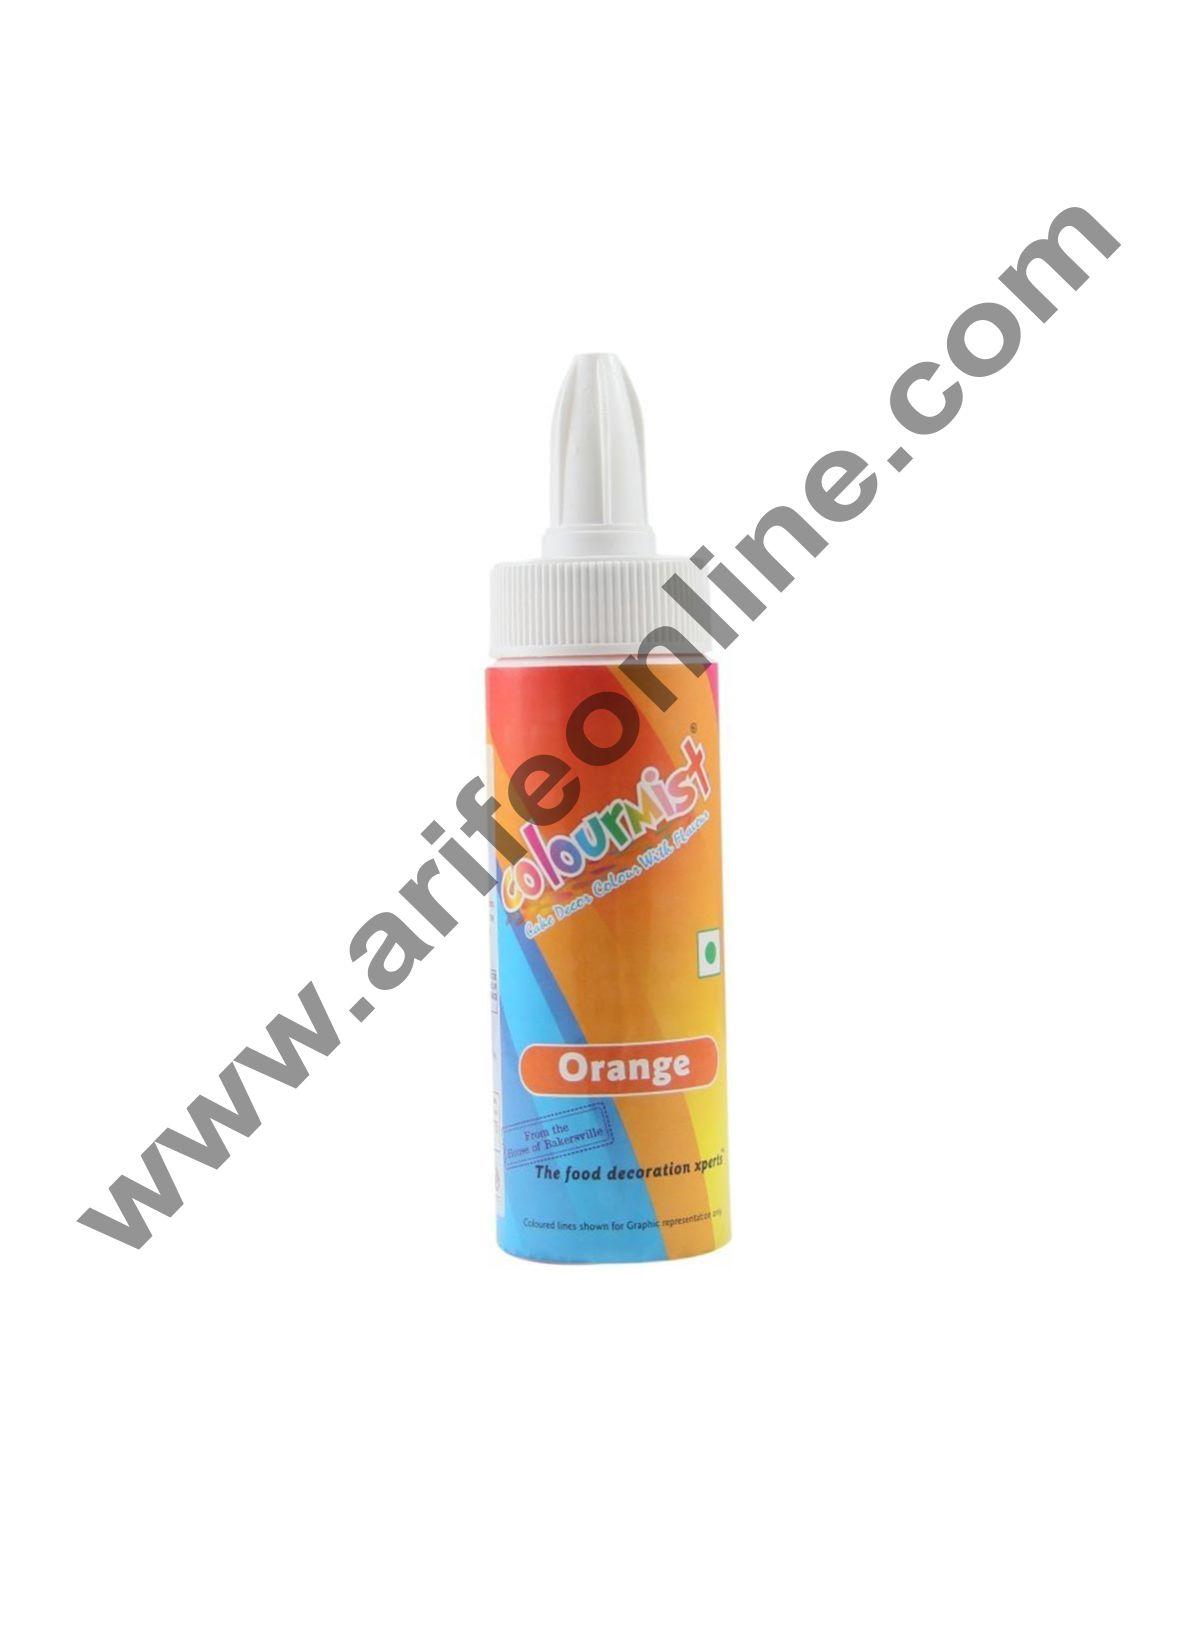 Colourmist Powder Spray (Orange), 60gm